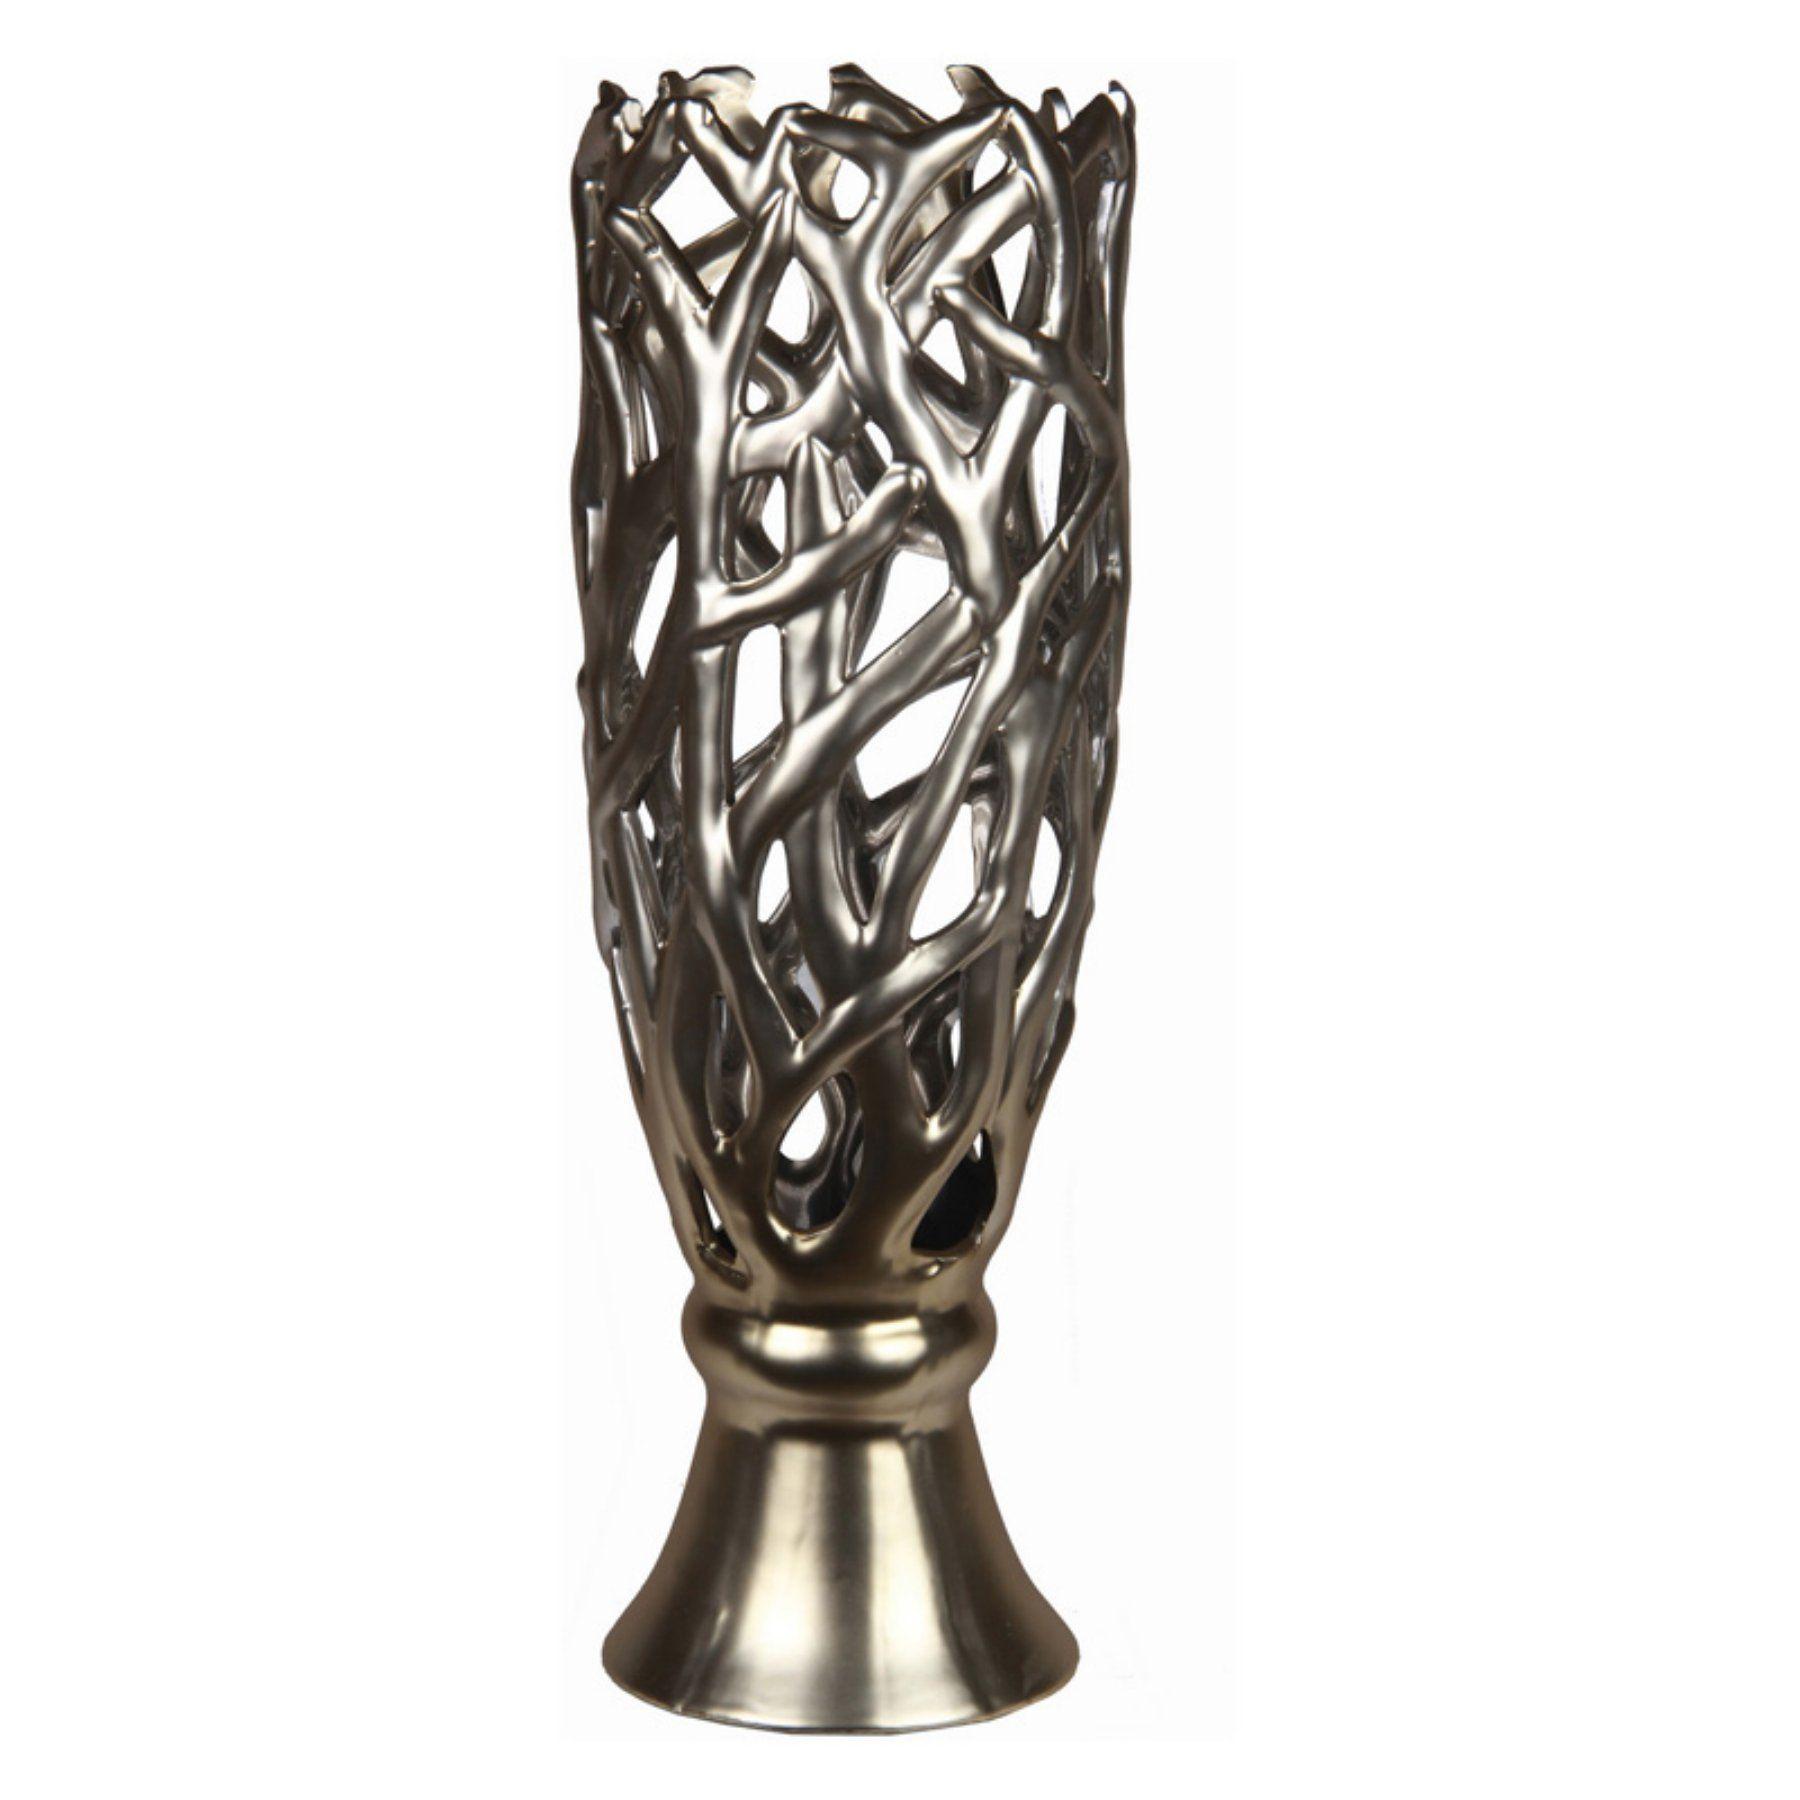 Privilege International Metallic Table Vase Chrome 78110 Table Vases Metal Vase Metal Table